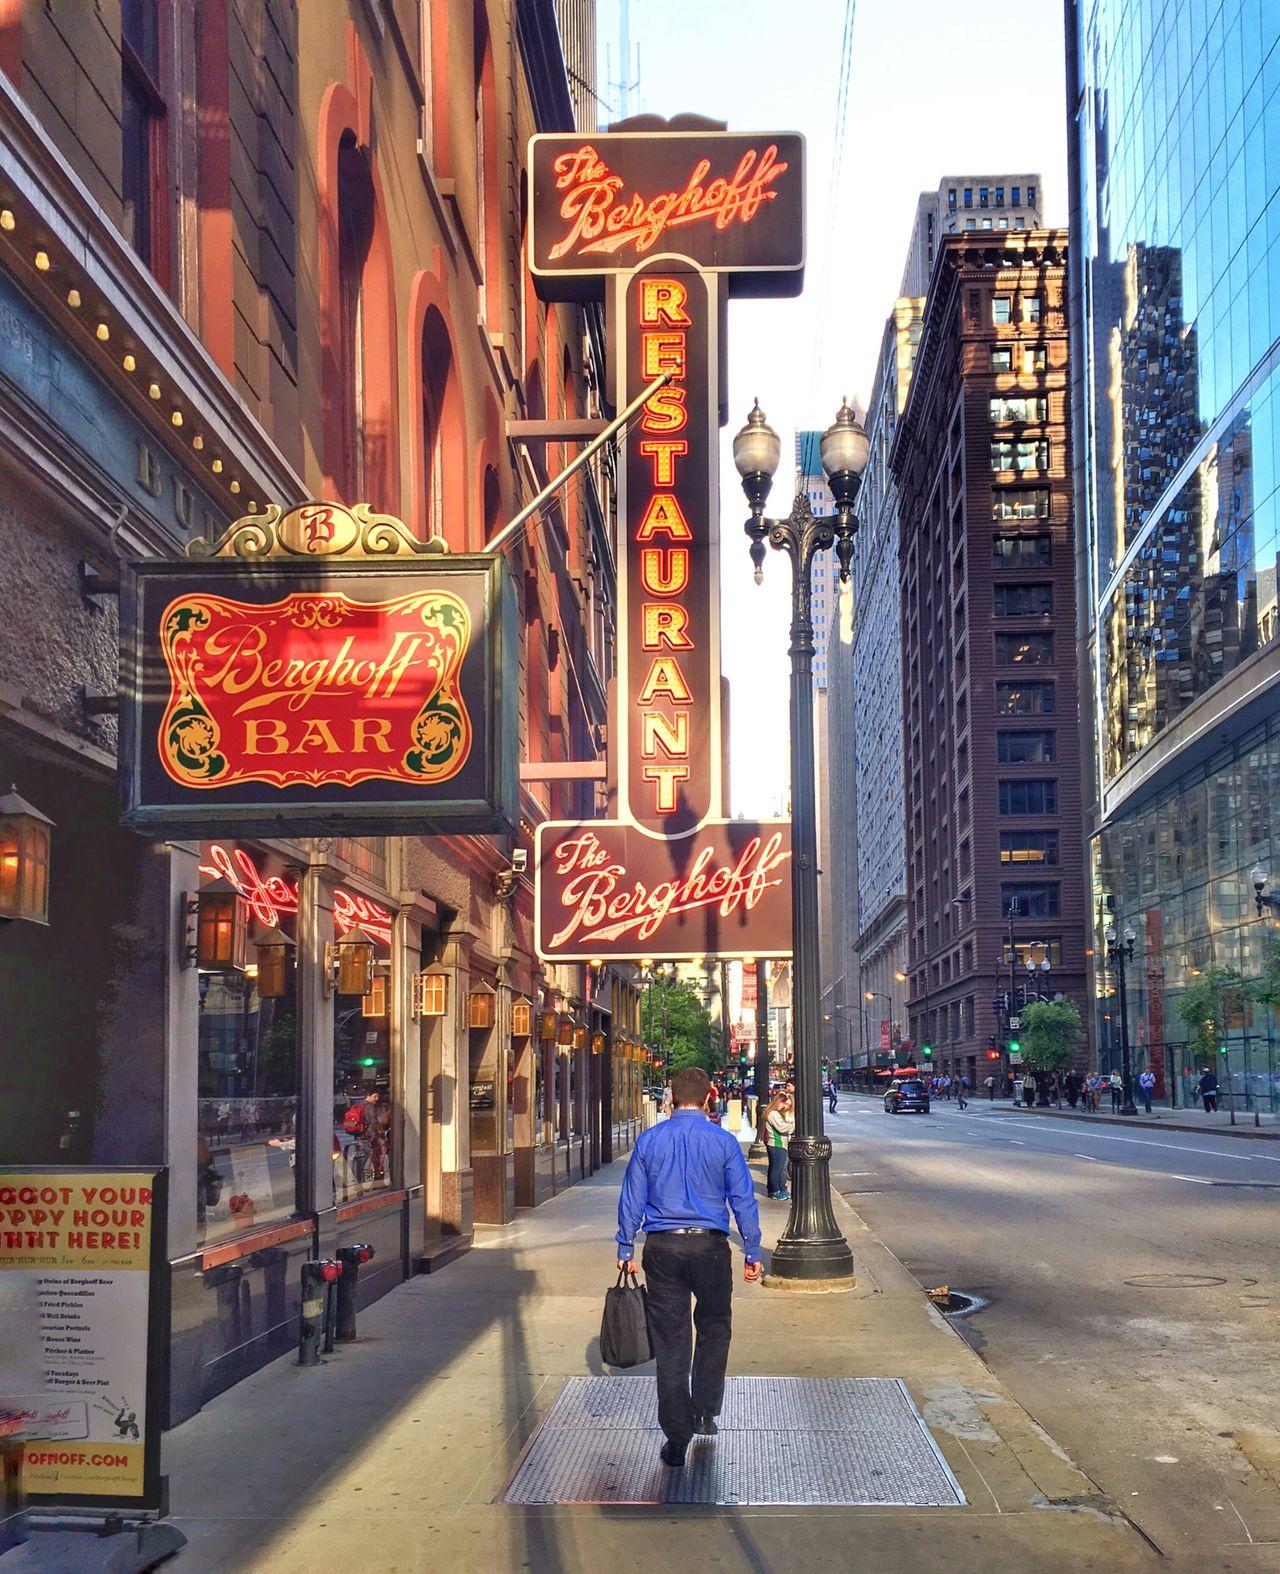 Chicago Classic Berghoff Bar And Restaurant 118 Years Old Chicago Architecture Chicagoloop Streetphotography Urban Landscape Urban Lifestyle EyeEm Best Shots Eyeemurban EyeEm Gallery Eyeemphotography Eye4photography  Eyeemfirstphoto Iphoneonly Amateurphotographer  Theatre District